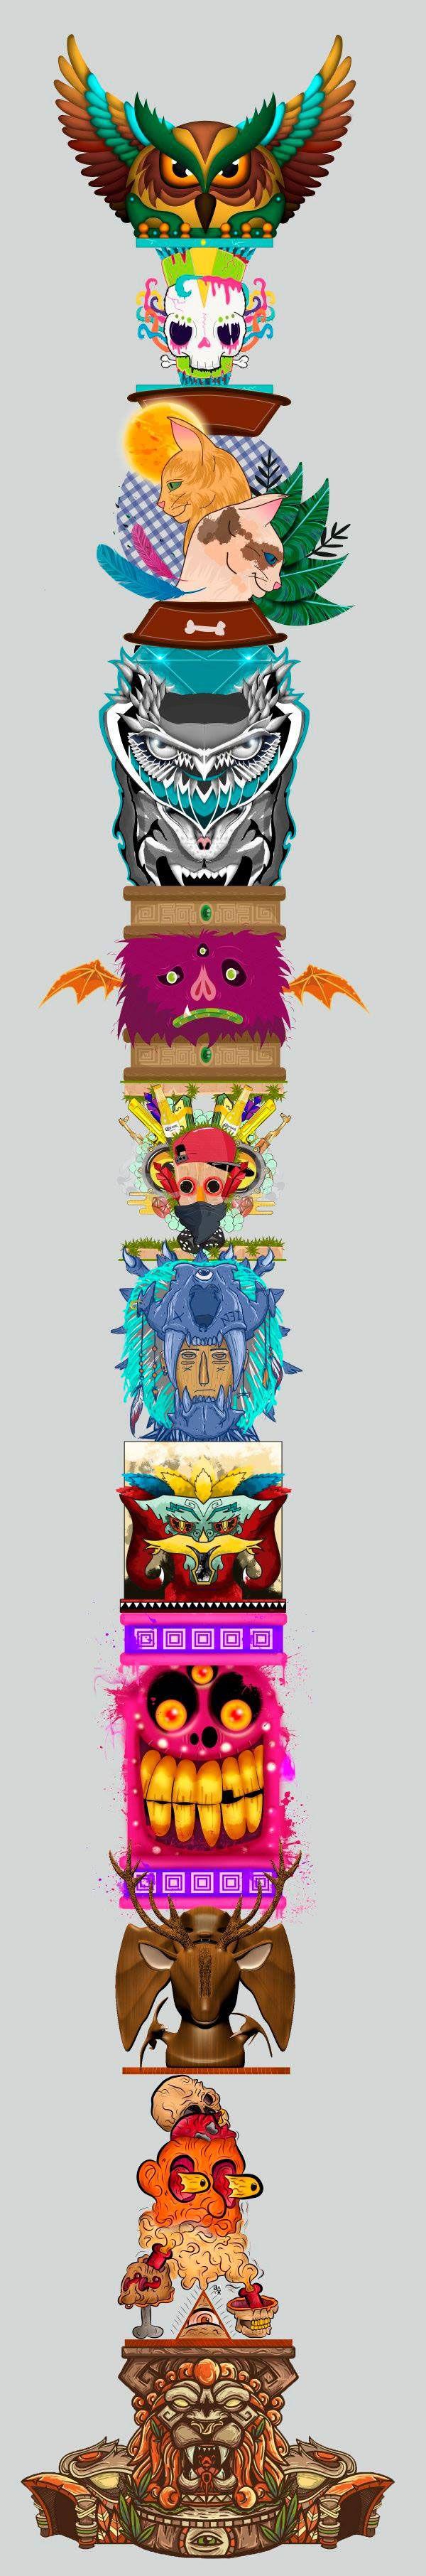 "Consulta mi proyecto @Behance: ""Collaborative illustration of a totemTótem en colectivo"" https://www.behance.net/gallery/46374345/Collaborative-illustration-of-a-totemTotem-en-colectivo"